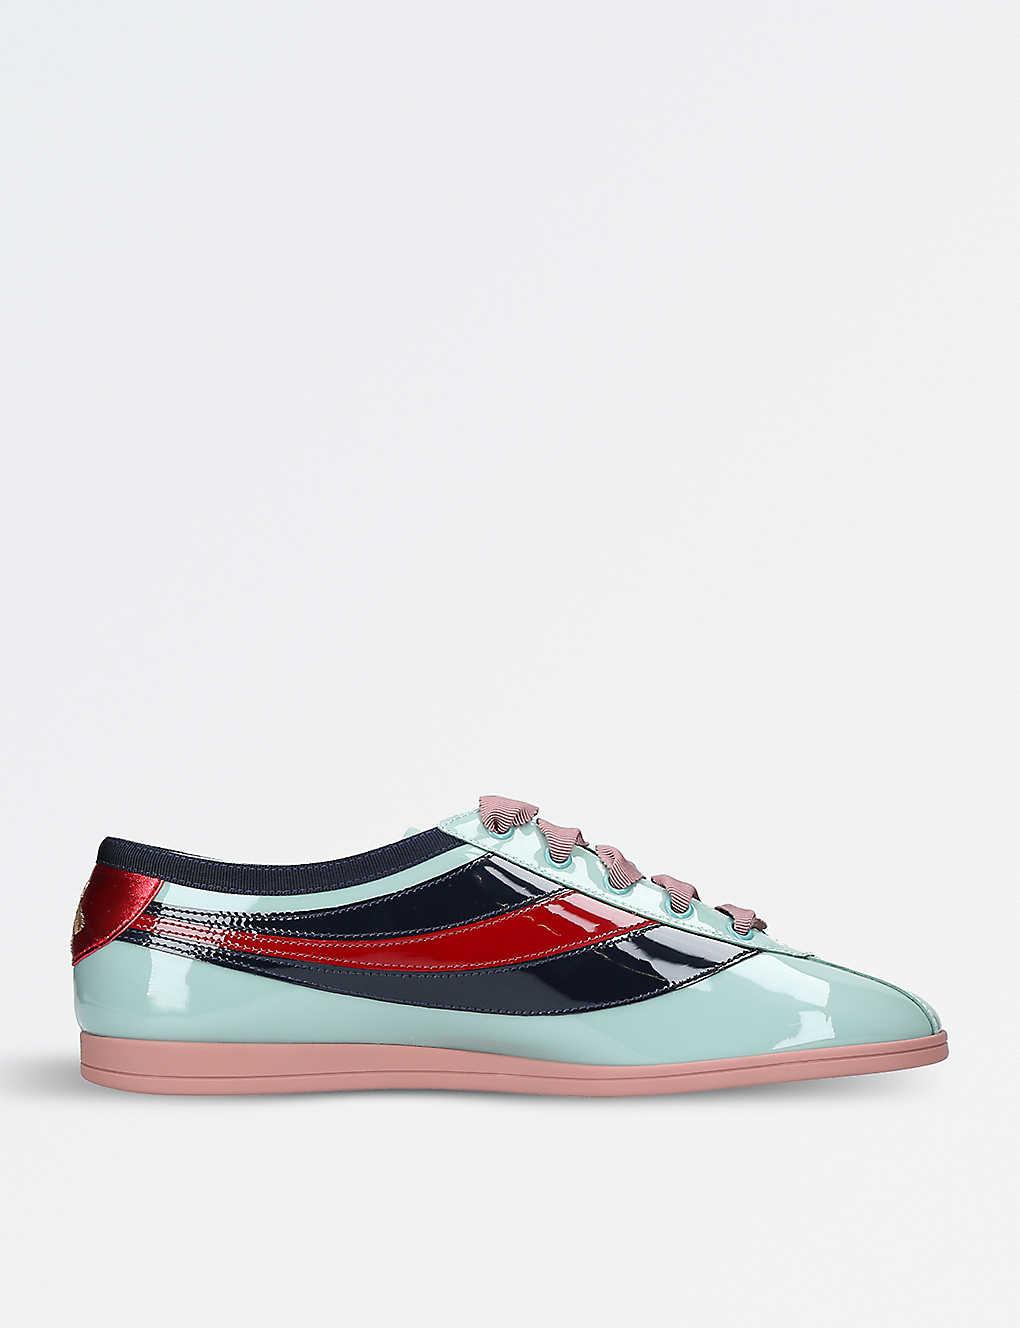 8e55c8092 GUCCI - Falacer patent leather sneakers | Selfridges.com